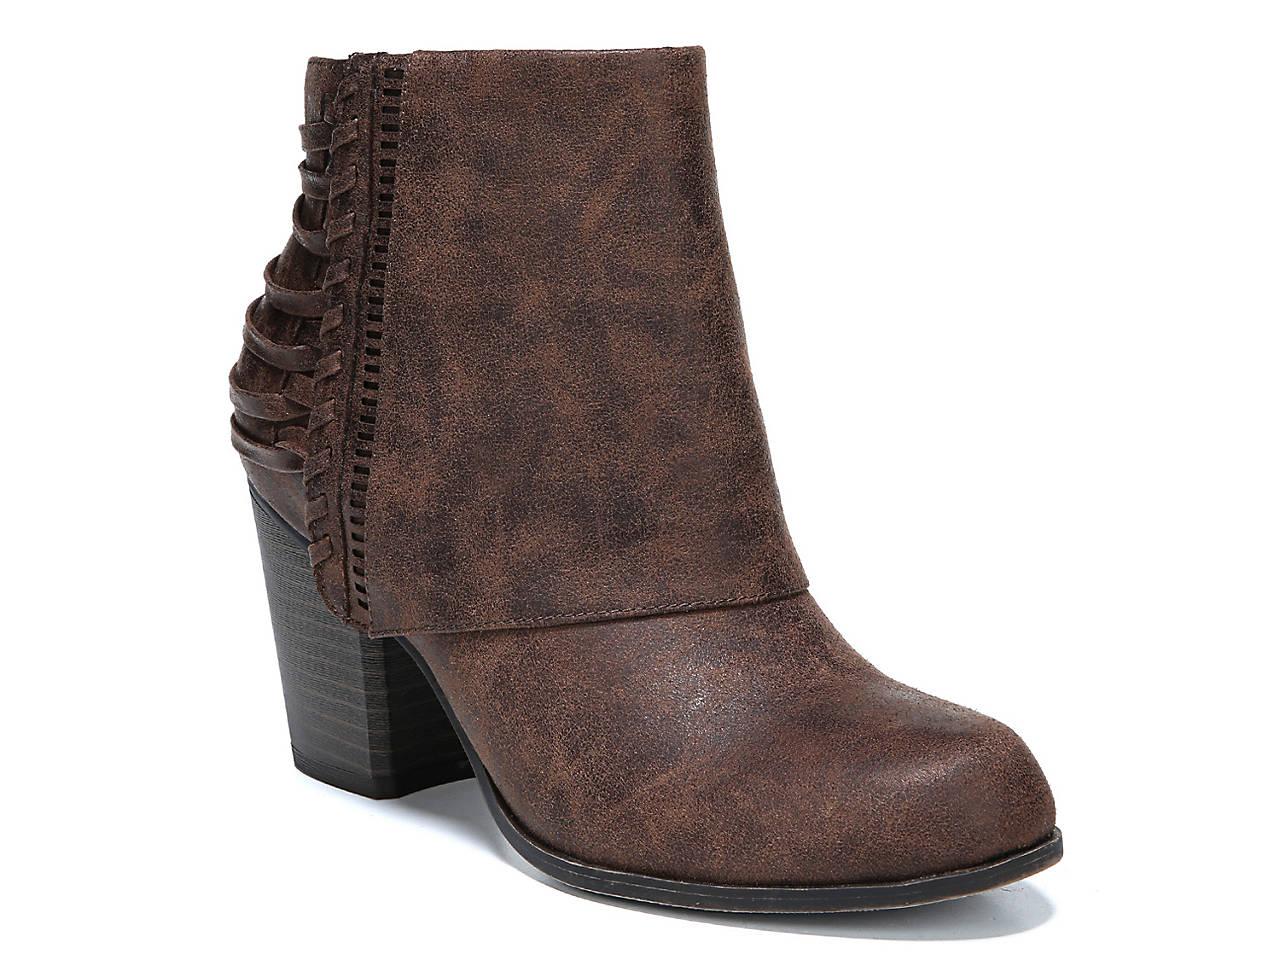 846744edc4a Fergalicious Taranto Bootie Women s Shoes